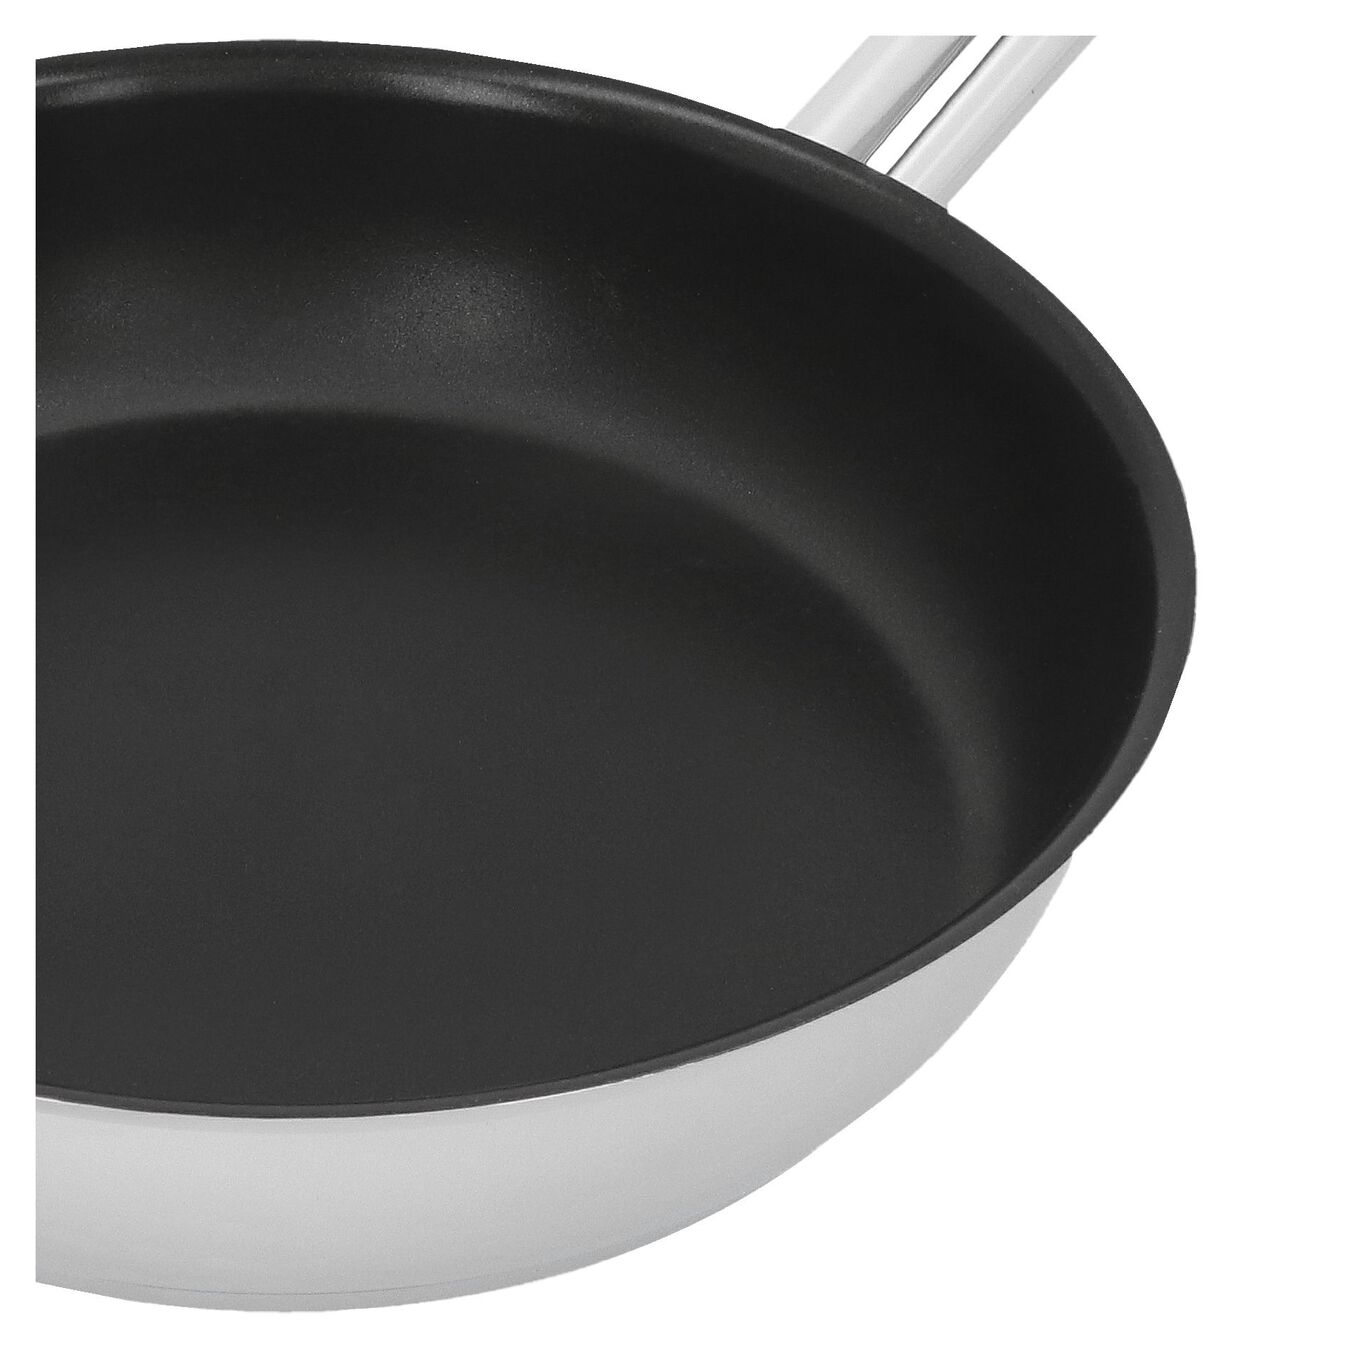 Stekpanna 24 cm, 18/10 Rostfritt stål, Silver-Svart,,large 2